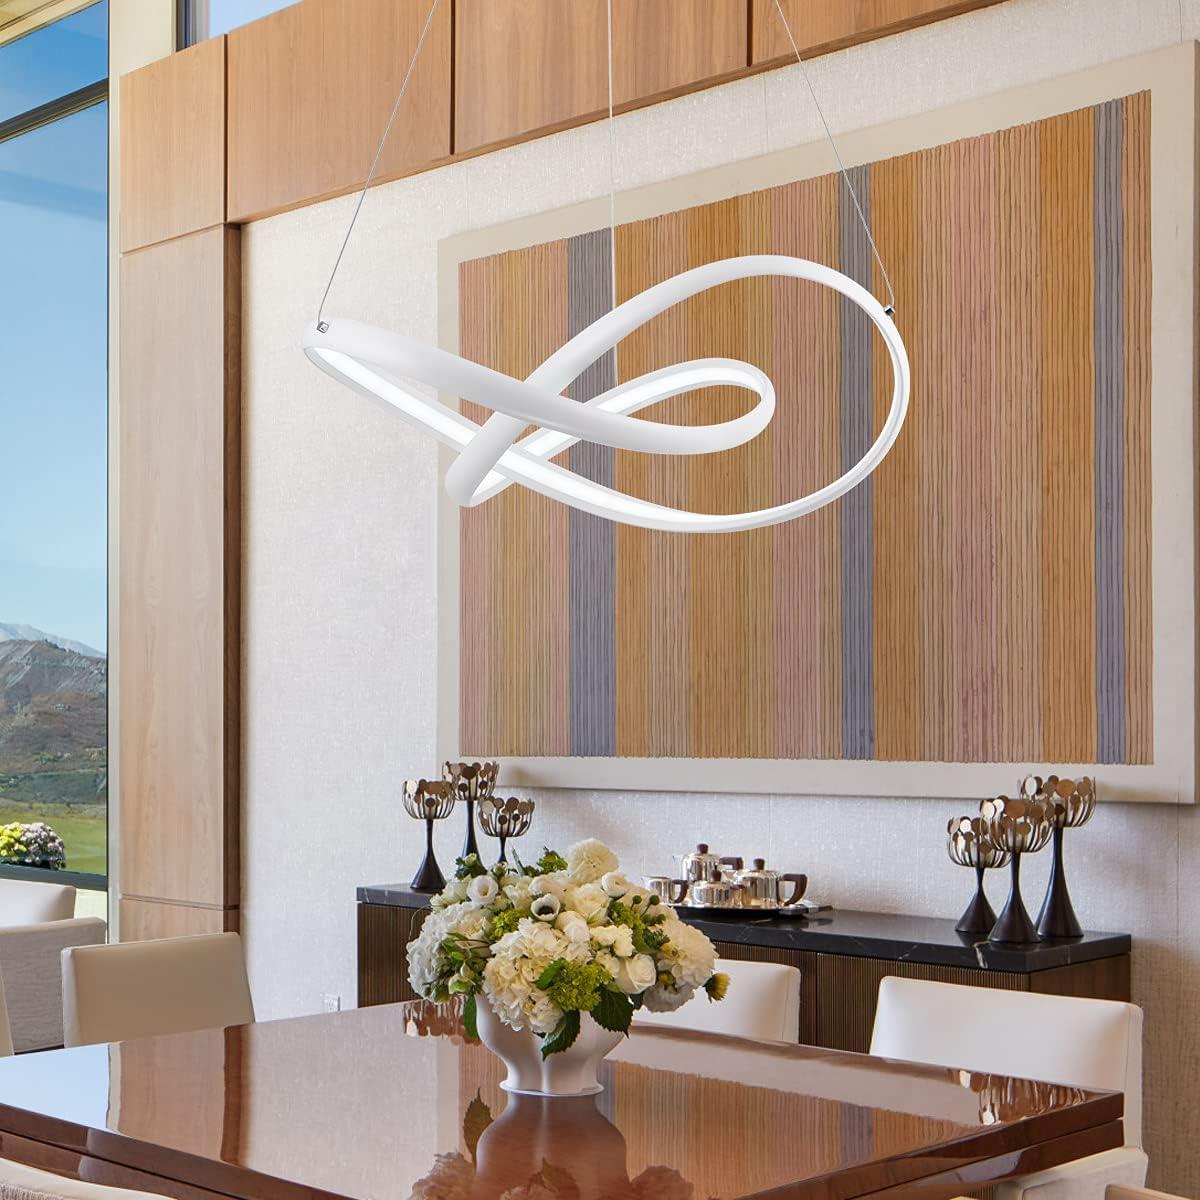 CHYING Modern Pendant Light Dimmable Super Popular brand Special SALE held Irregular 3-Leaves LED Rin